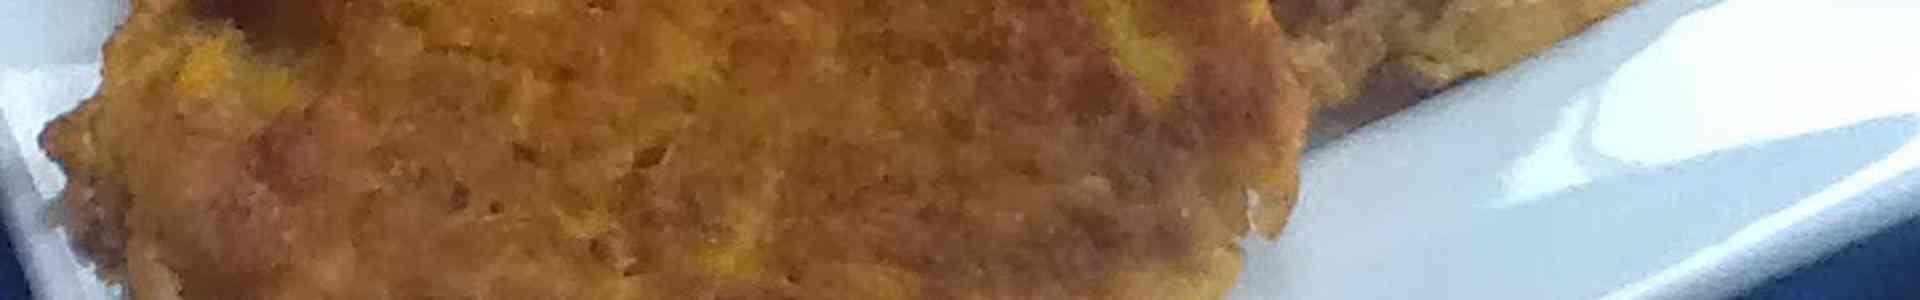 Pompoen-pannenkoeken